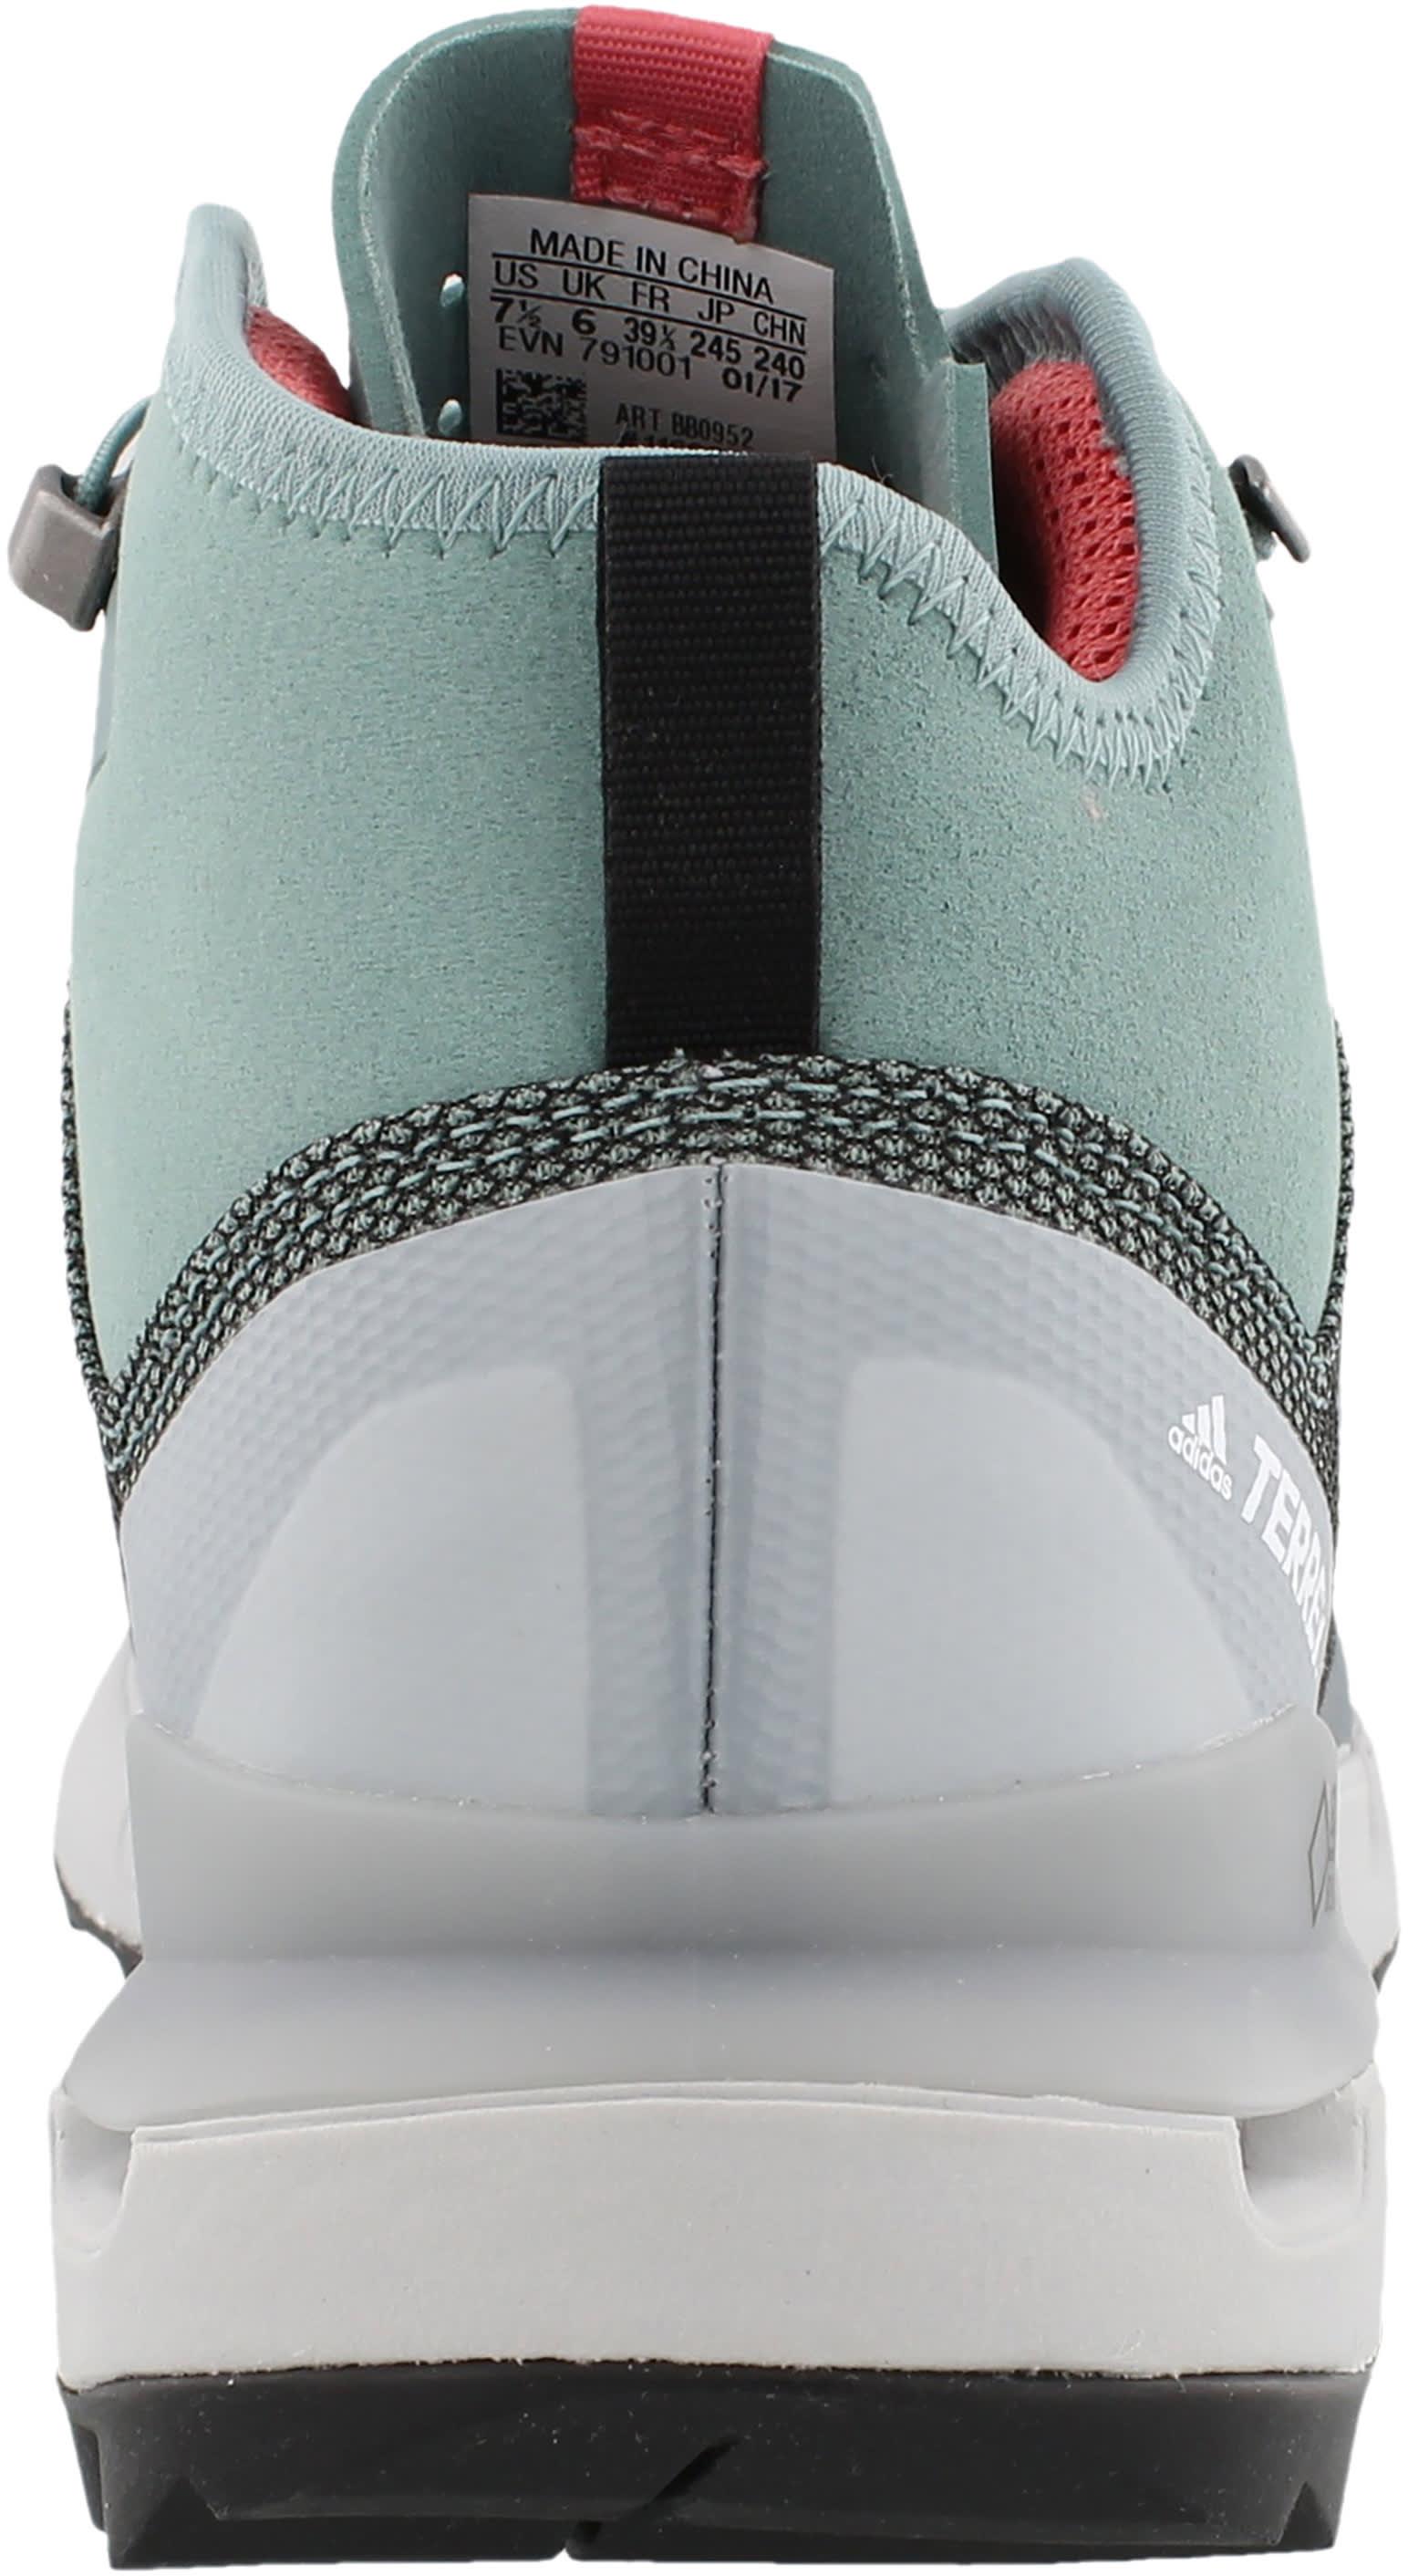 On Sale Adidas Terrex Fast Gtx Surround Hiking Boots